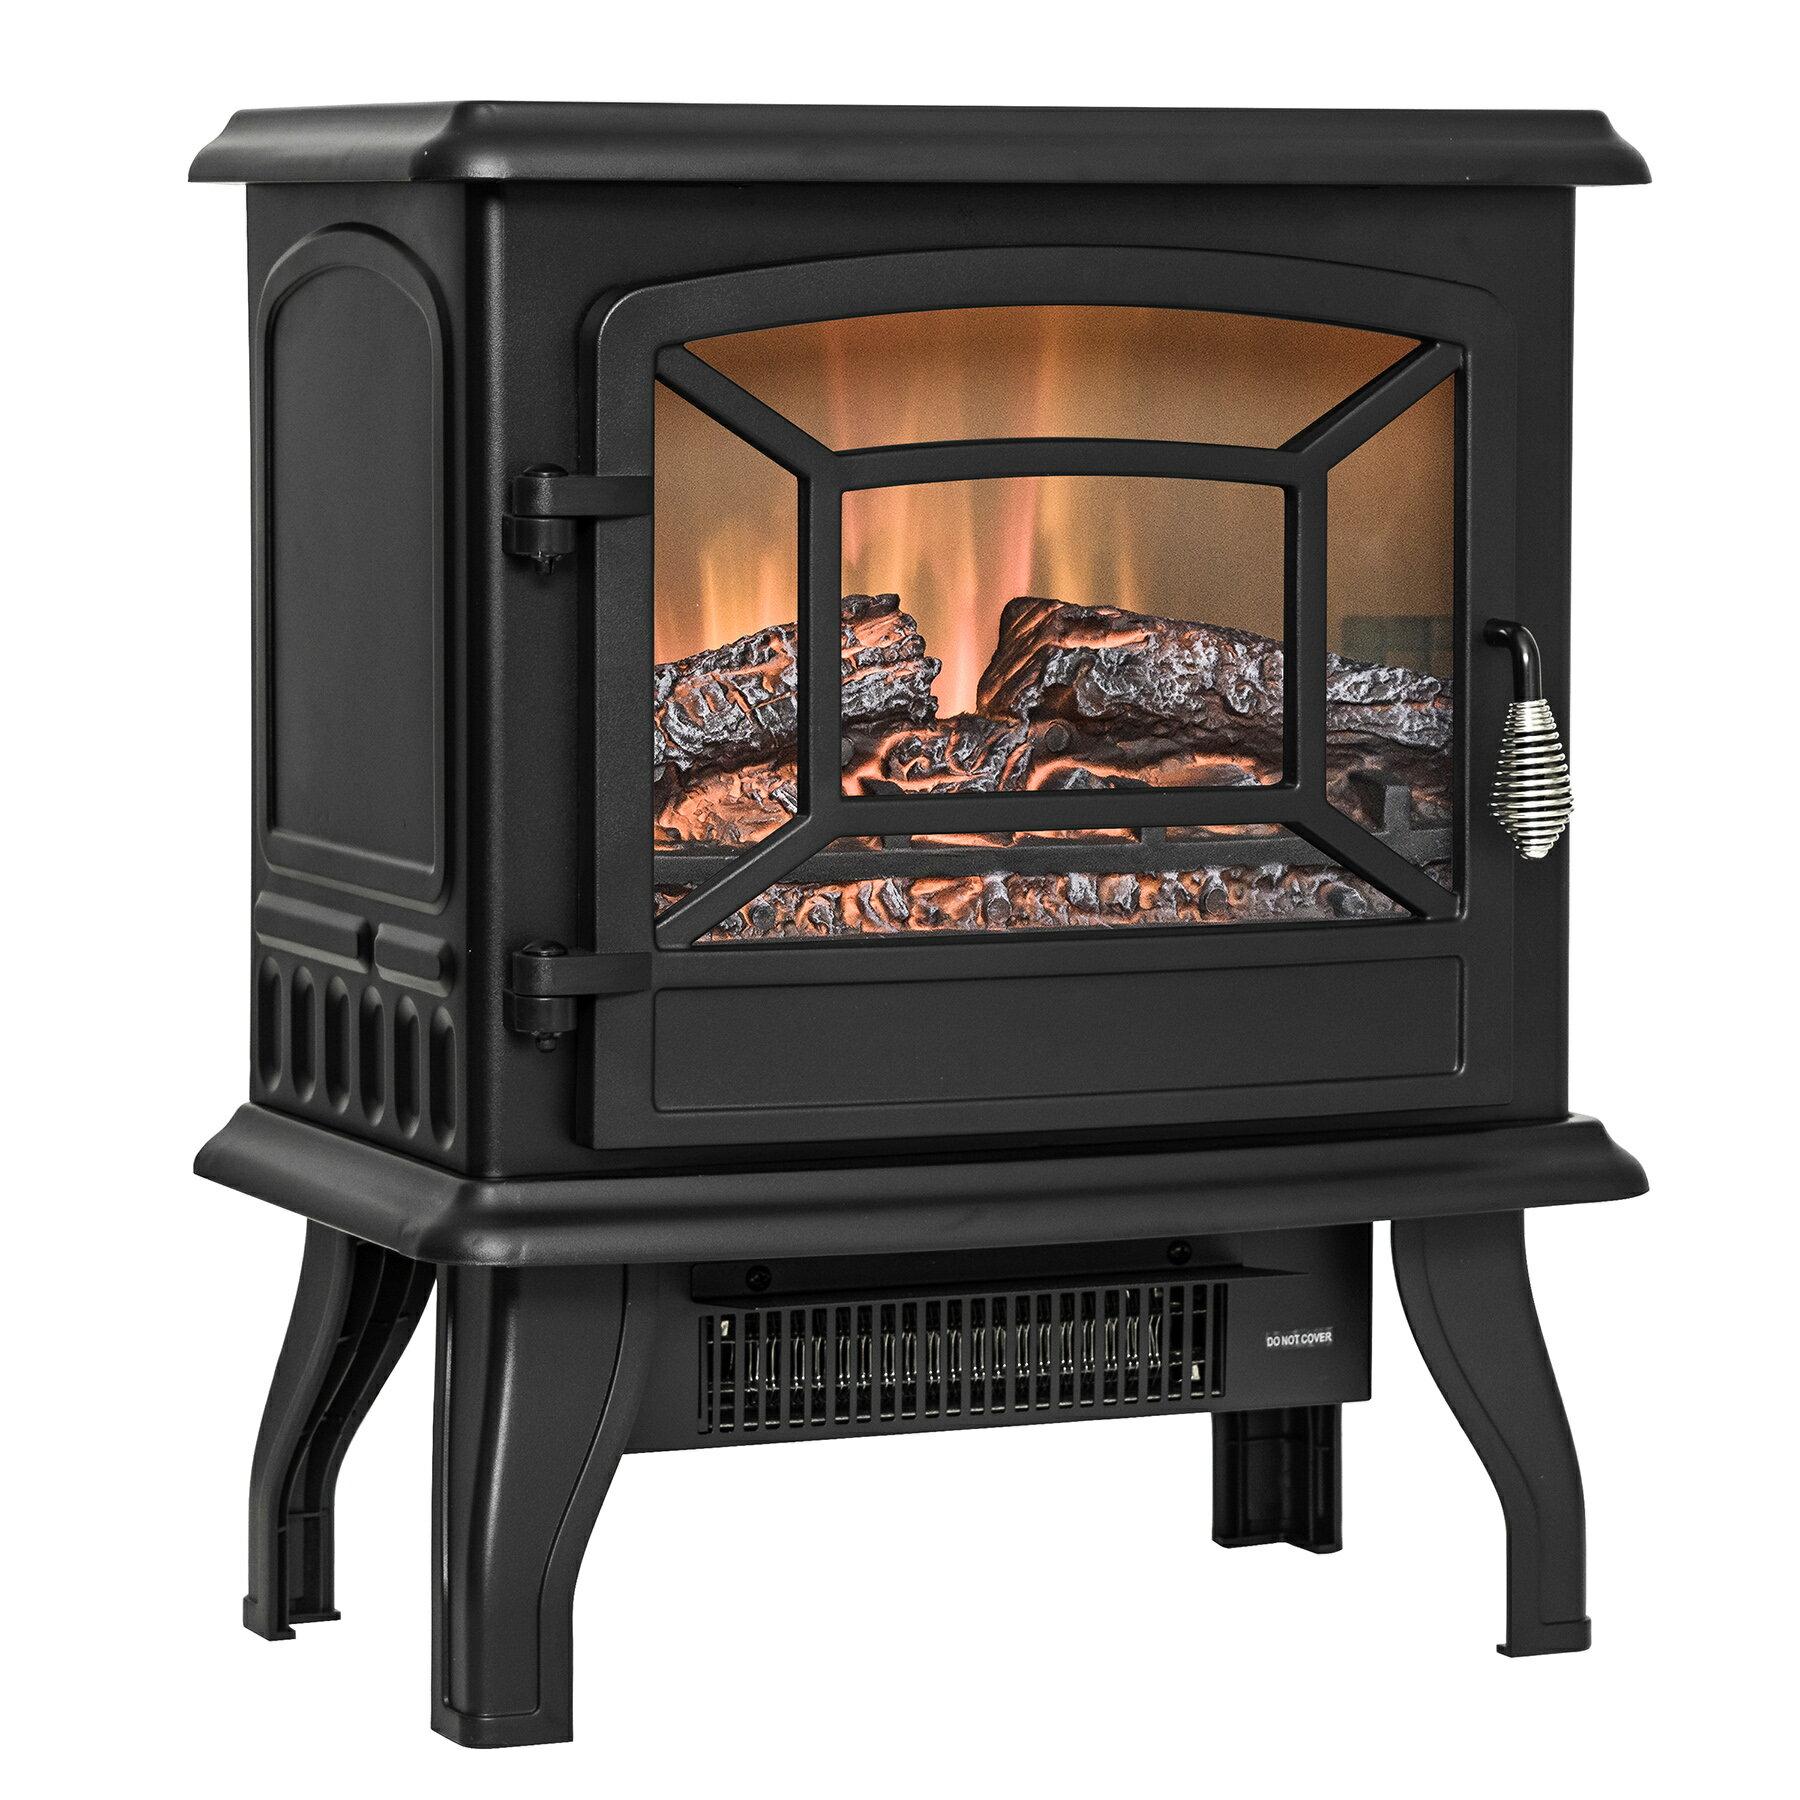 "AKDY 17"" Black Finish Freestanding Portable Electric Fireplace Heater 2 Setting Level 4"